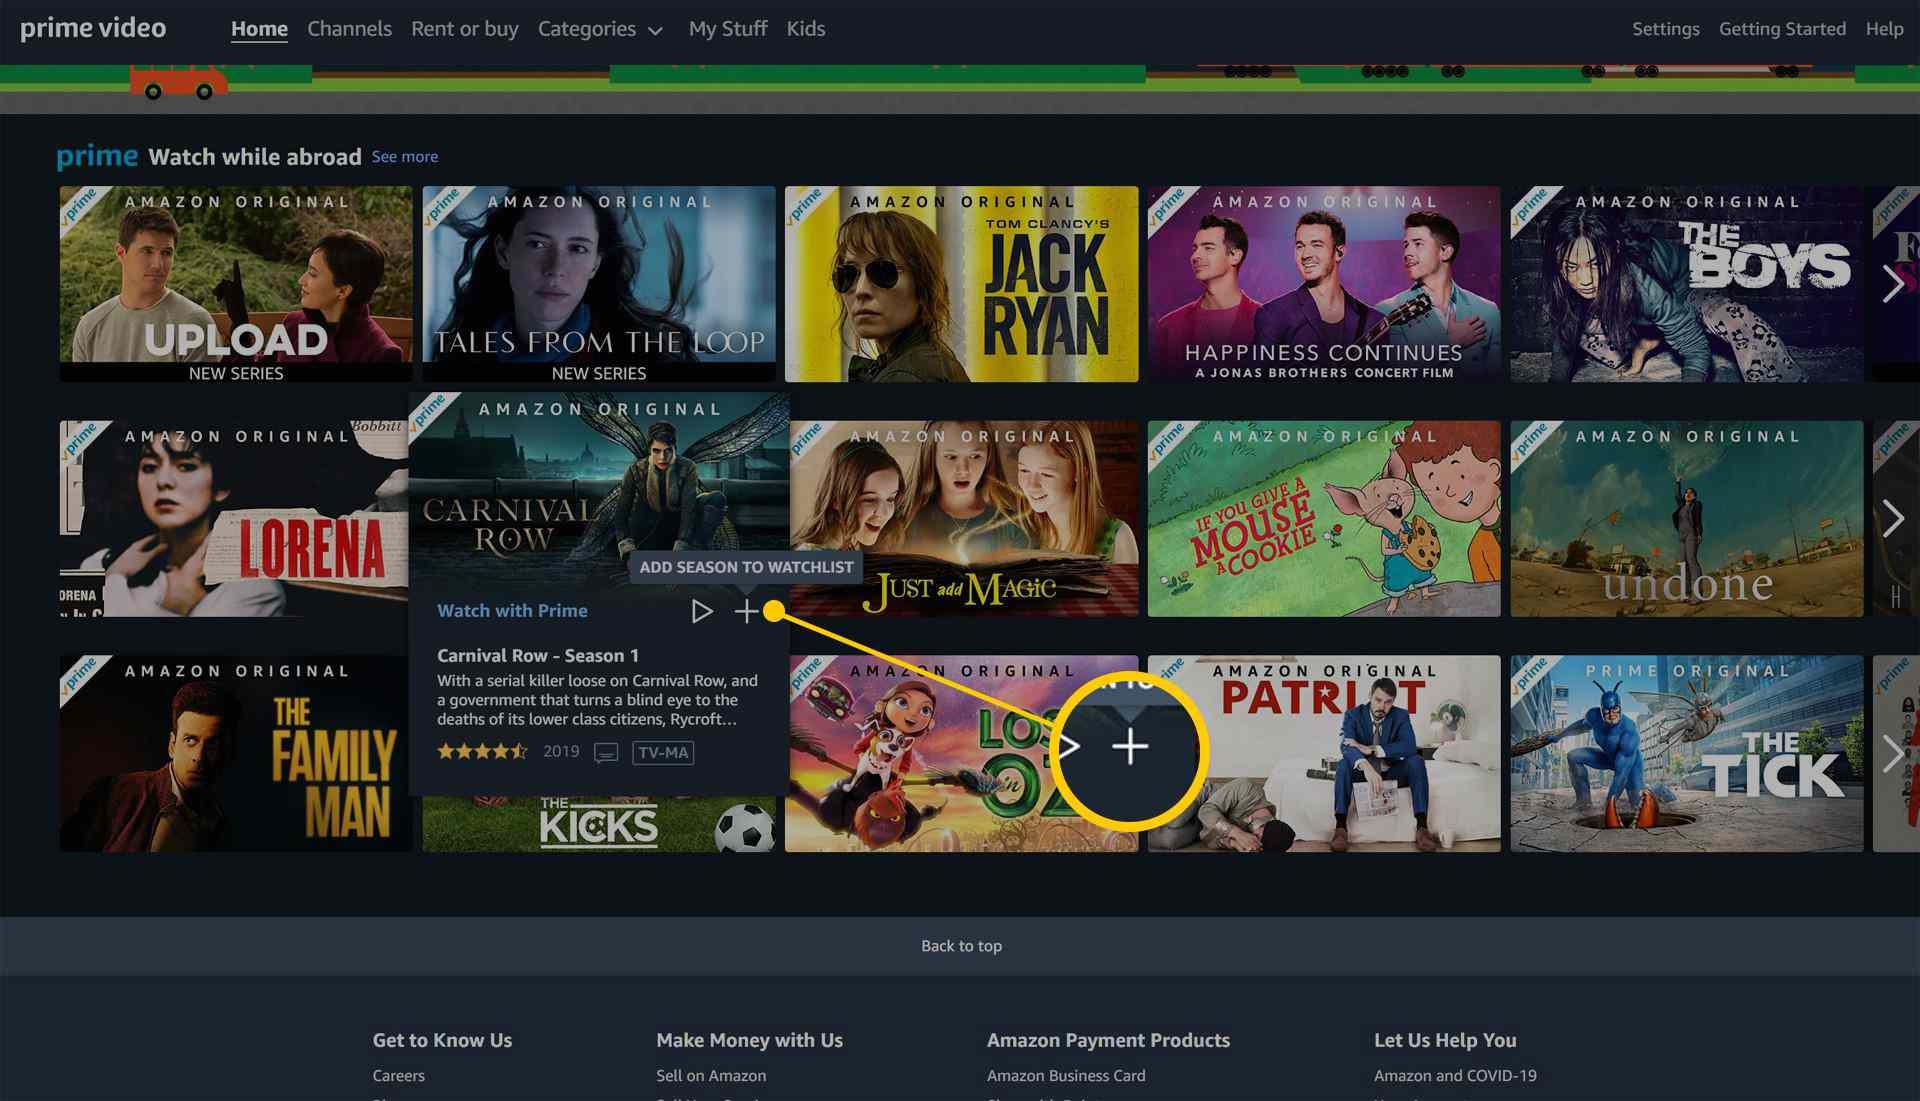 Amazon Prime Video page on the Amazon website.